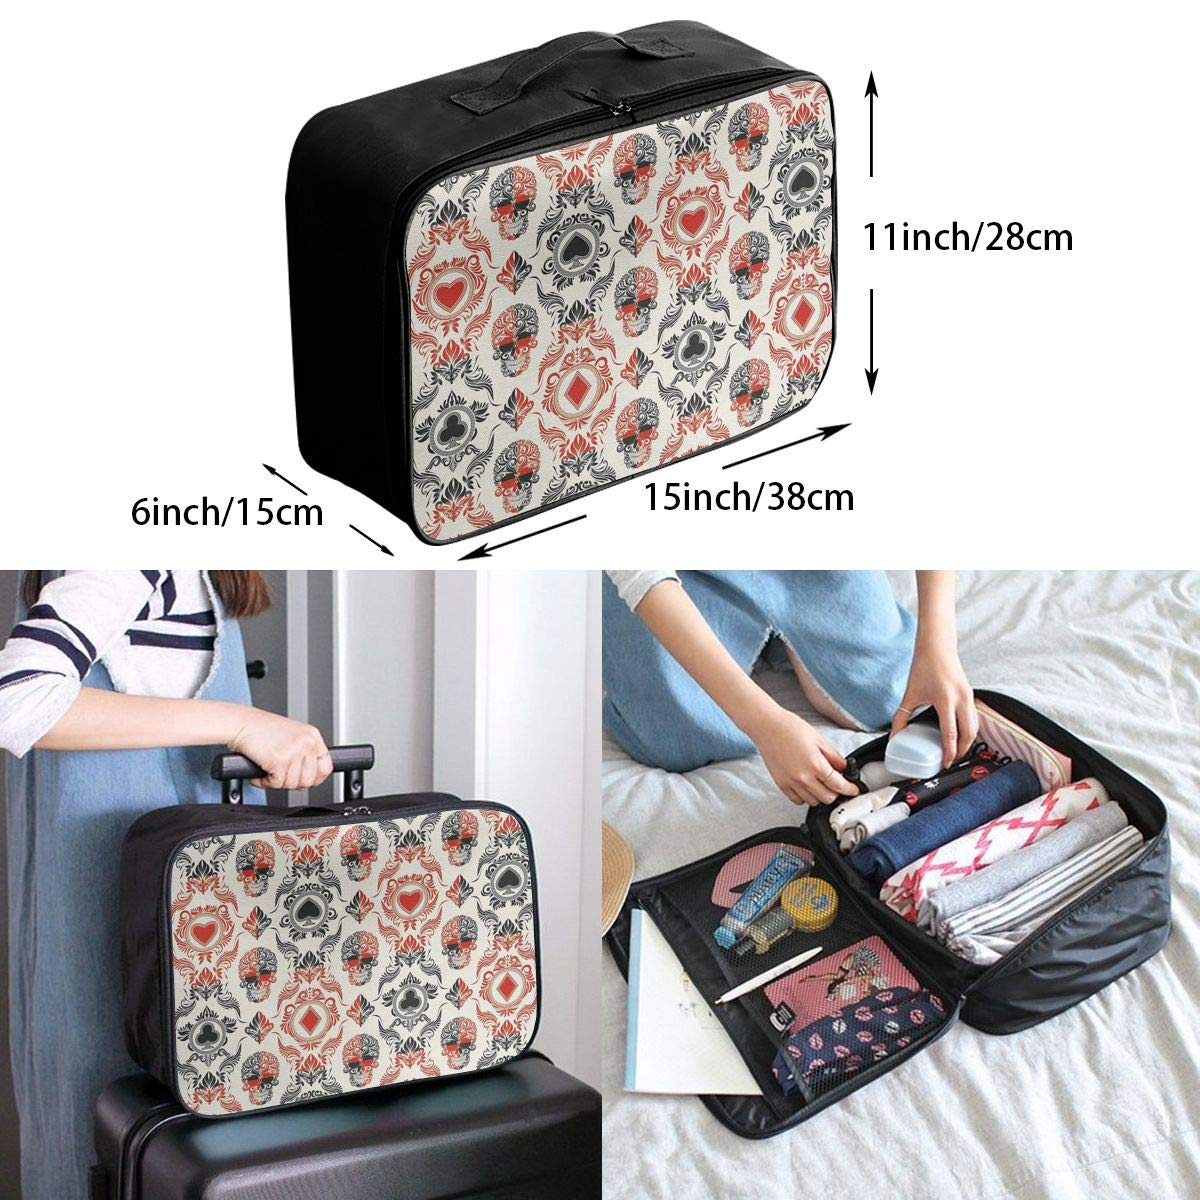 ADGAI Playing Card Themed Canvas Travel Weekender Bag,Fashion Custom Lightweight Large Capacity Portable Luggage Bag,Suitcase Trolley Bag